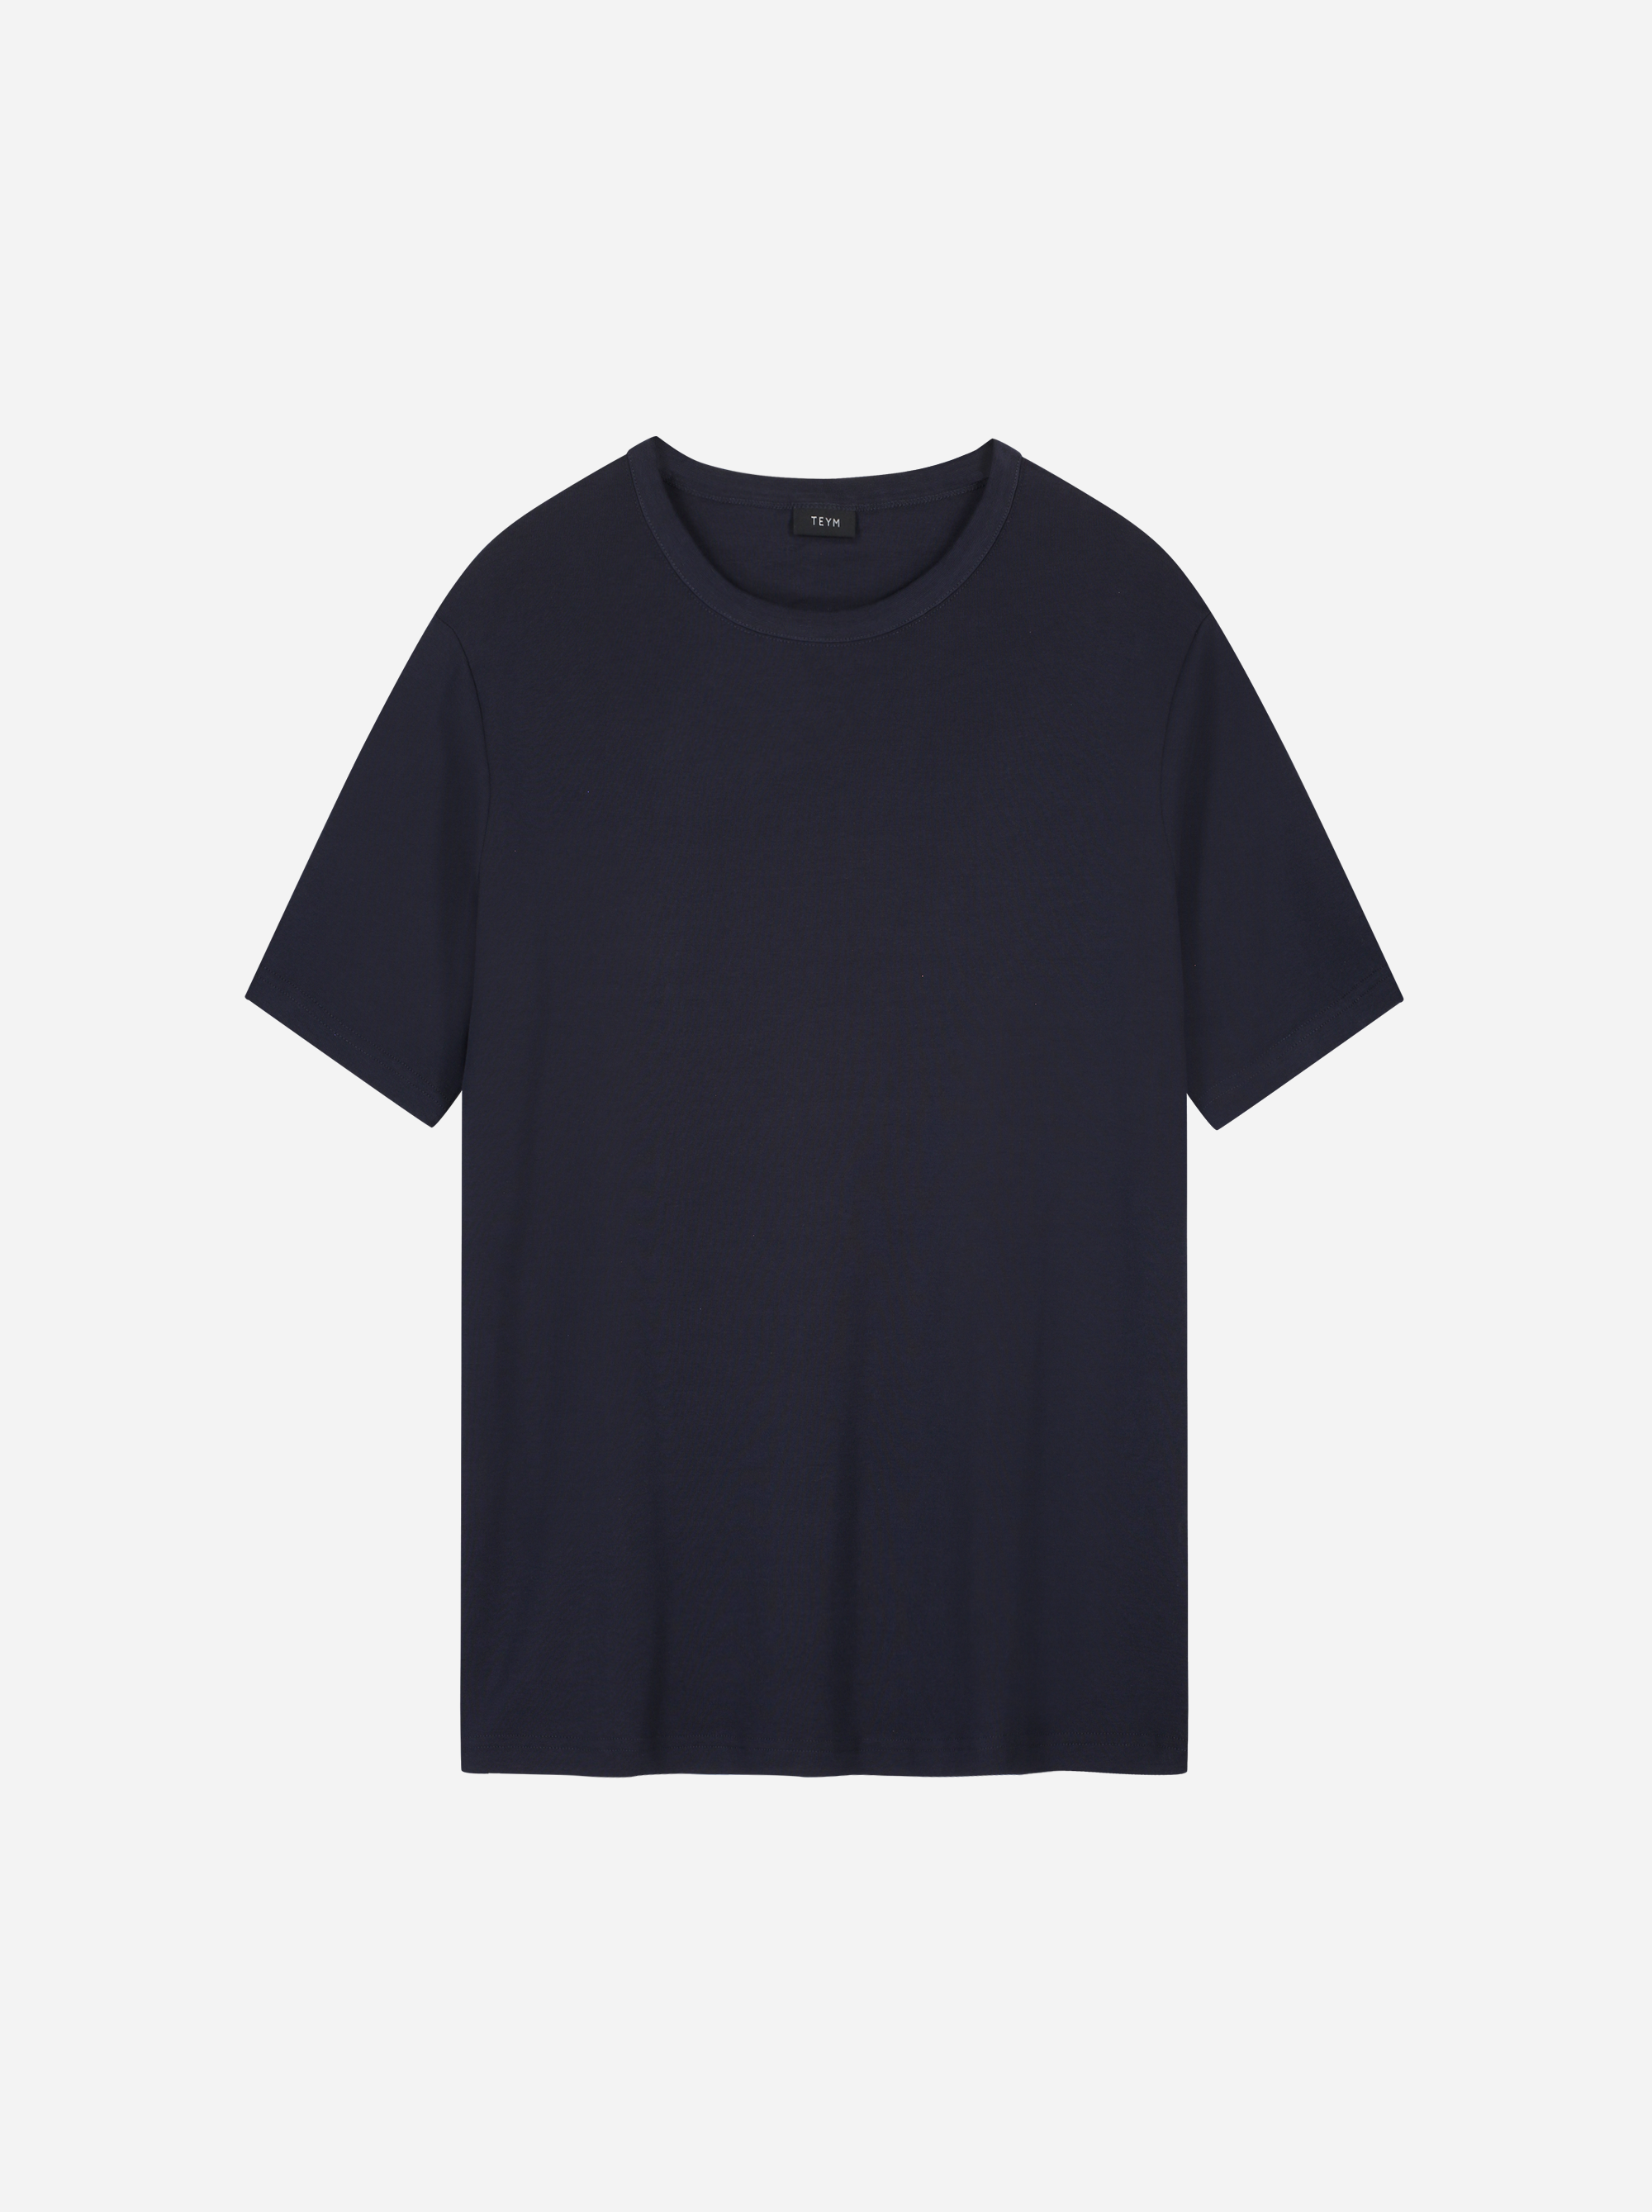 Teym - The T-Shirt - Men - Blue - 4